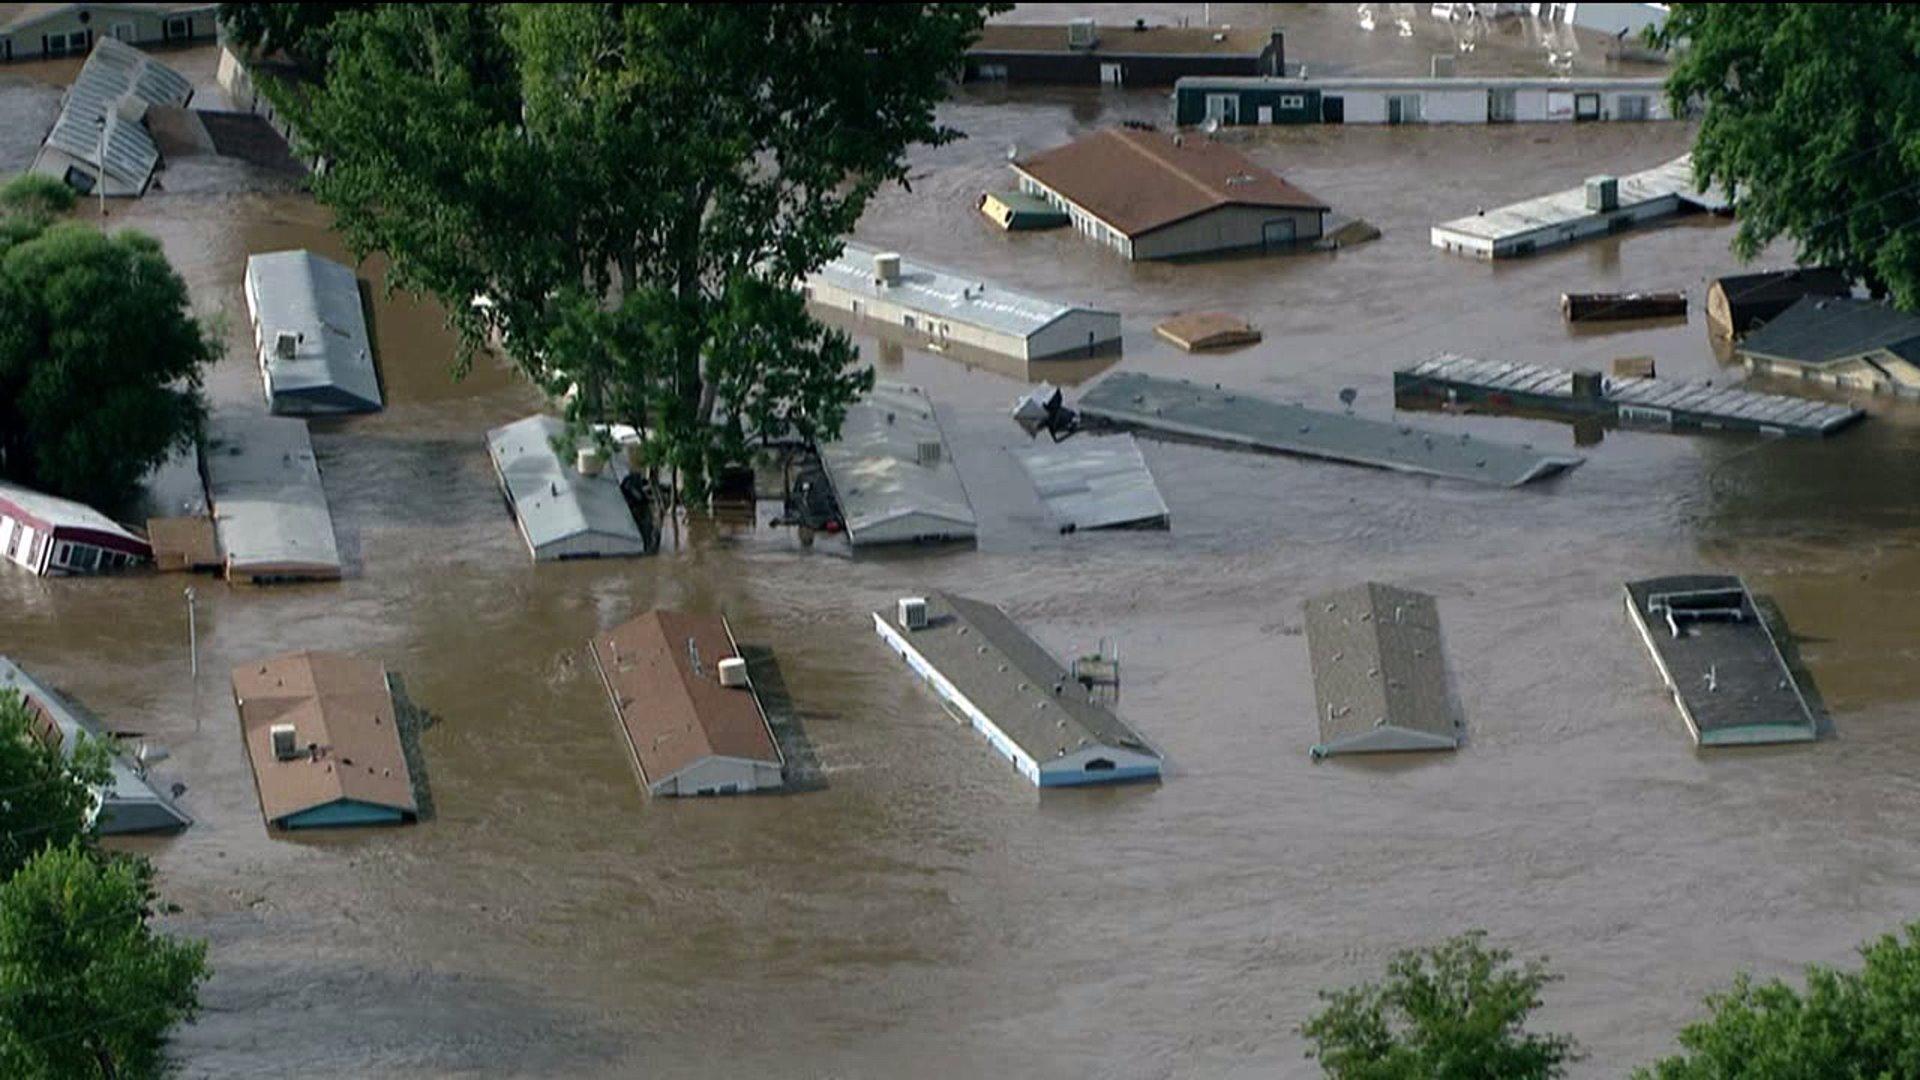 Flooding near Evans, Colo. Sept. 2013